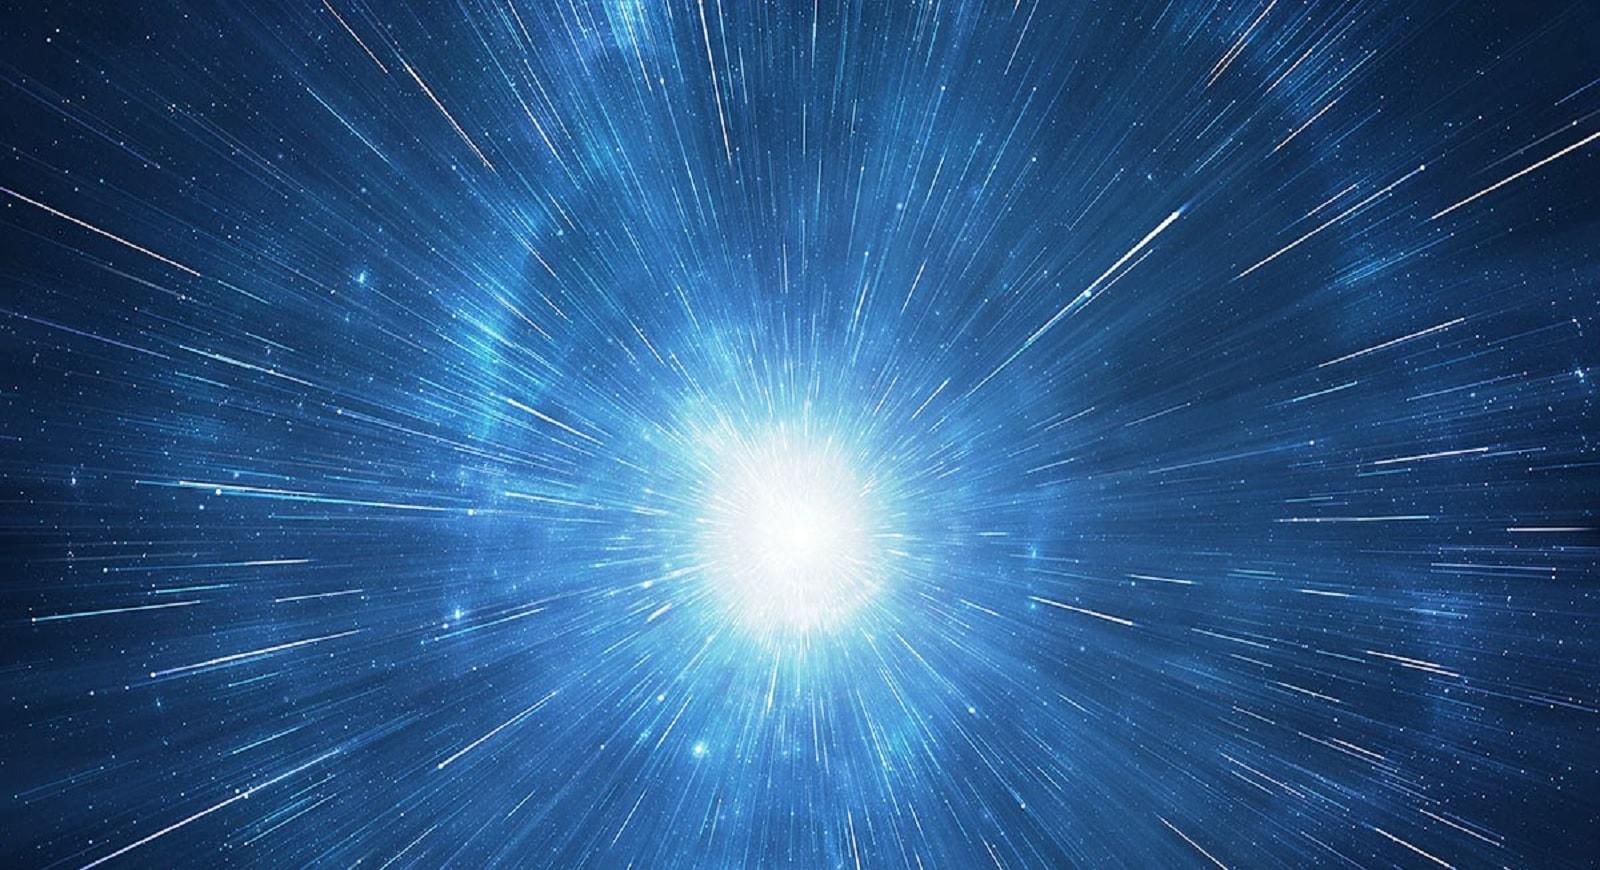 annee lumiere distance astronomie